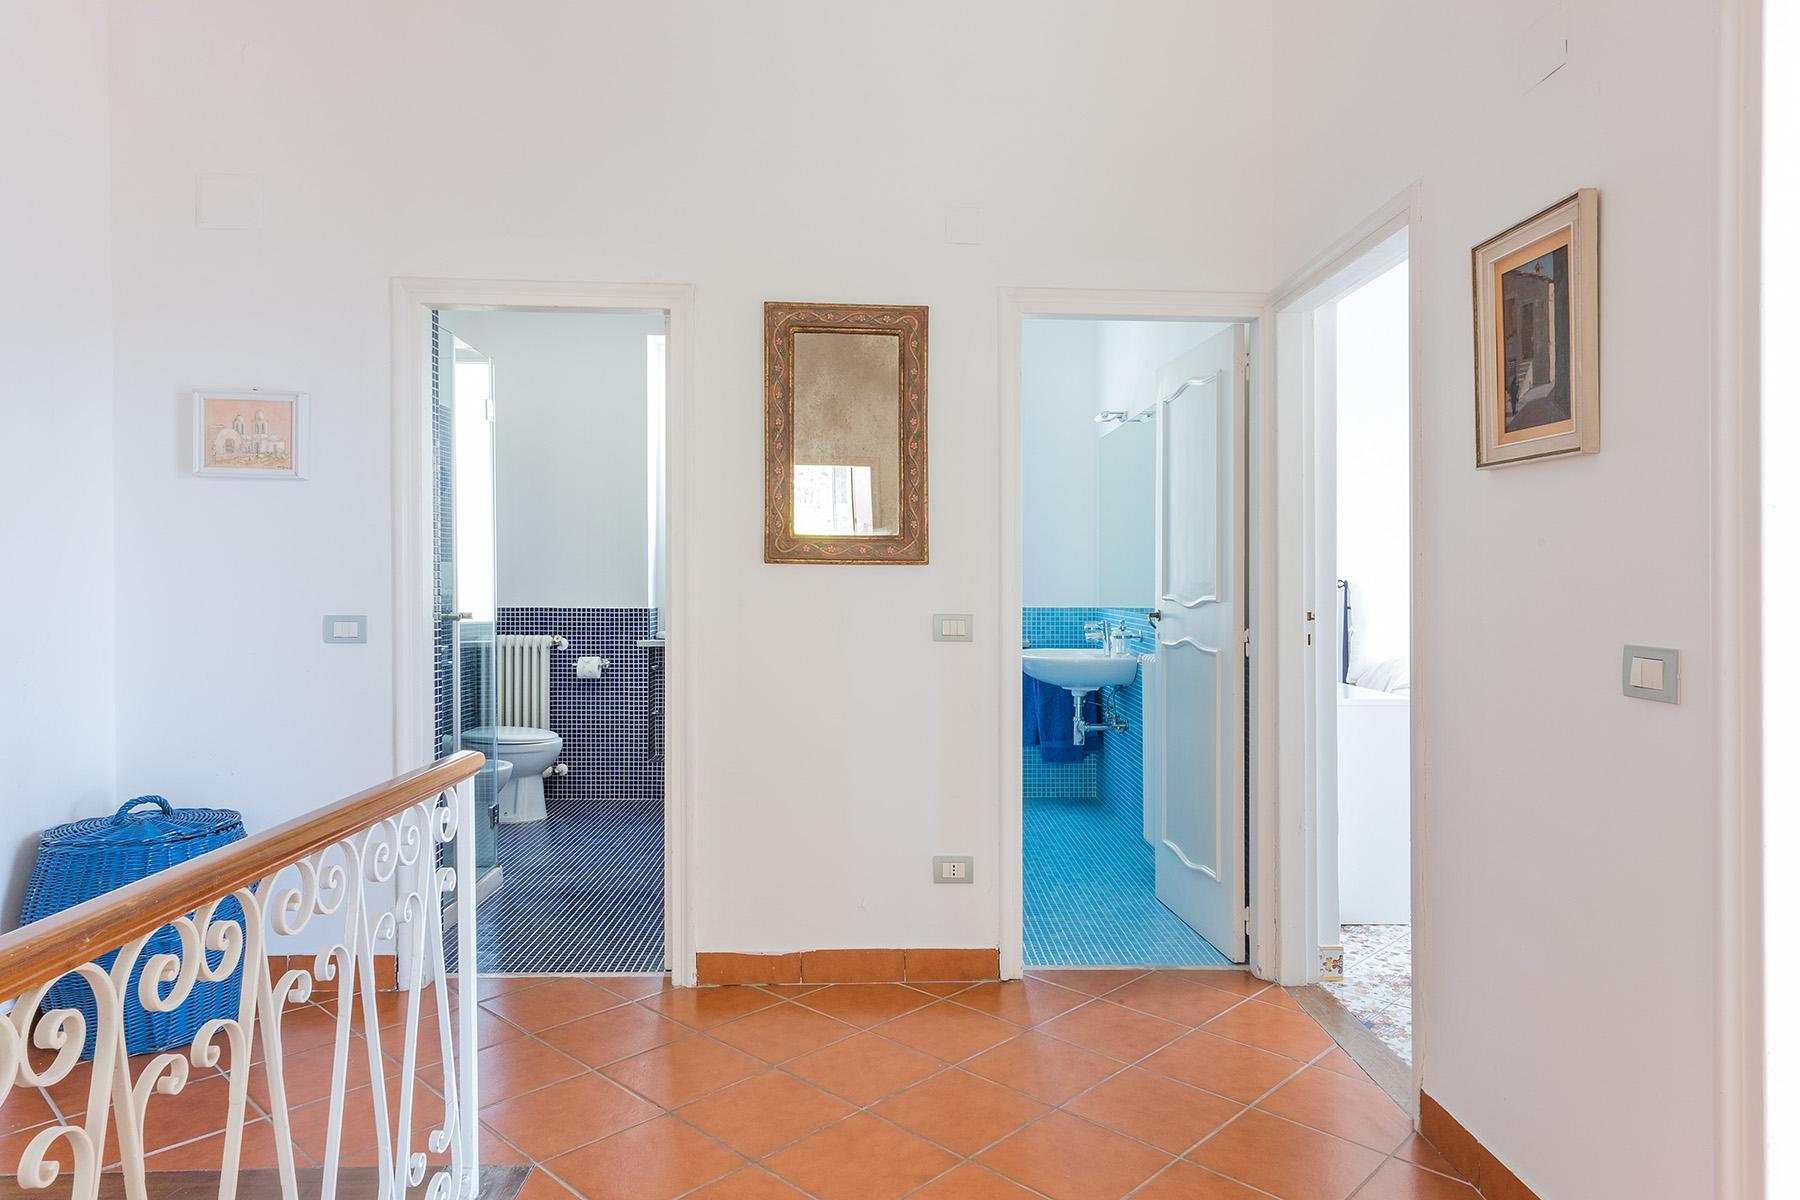 Прекрасная вилла с панорамным видом на море в центре легендарного острова Капри, Италия - 23